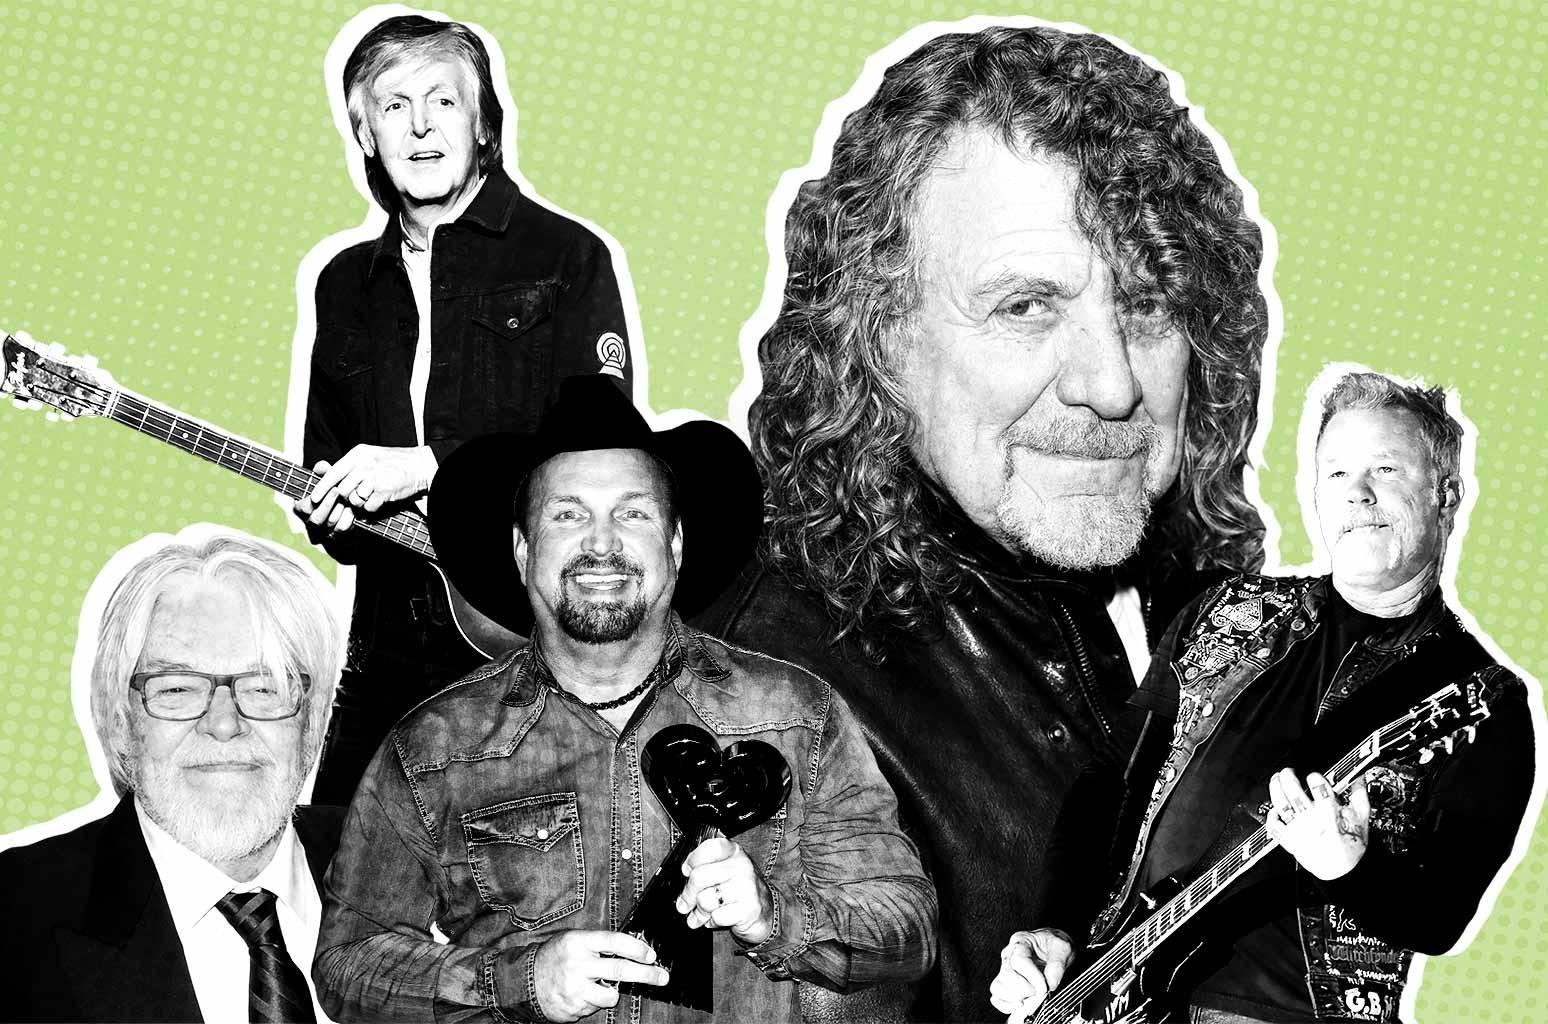 From left: Seger, Paul McCartney, Brooks, Plant and Metallica's James Hetfield.